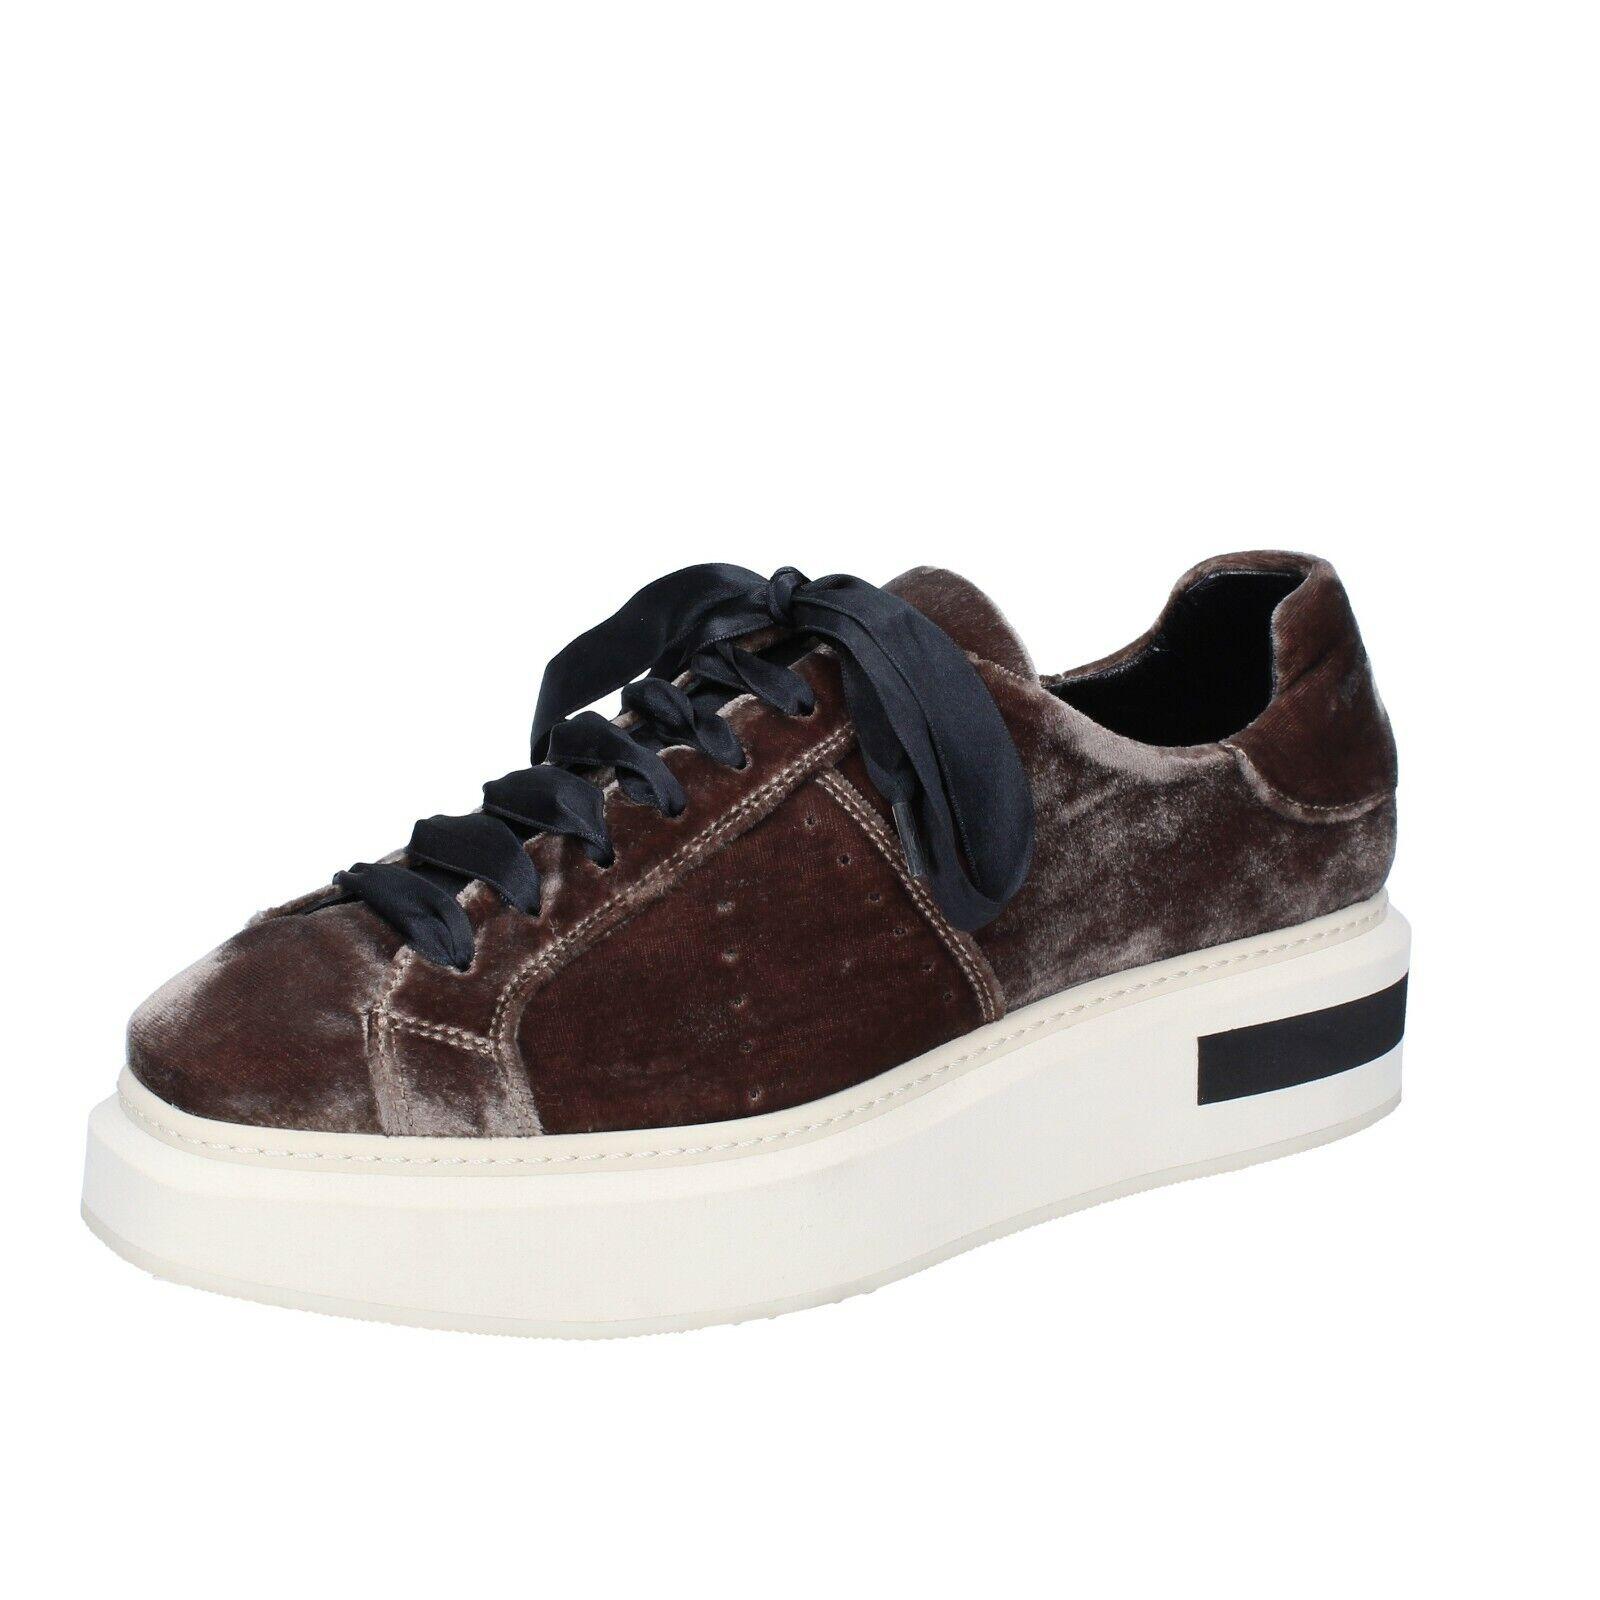 Women's shoes MANUEL BARCELO 10 (EU 40) sneakers brown velvet BS332